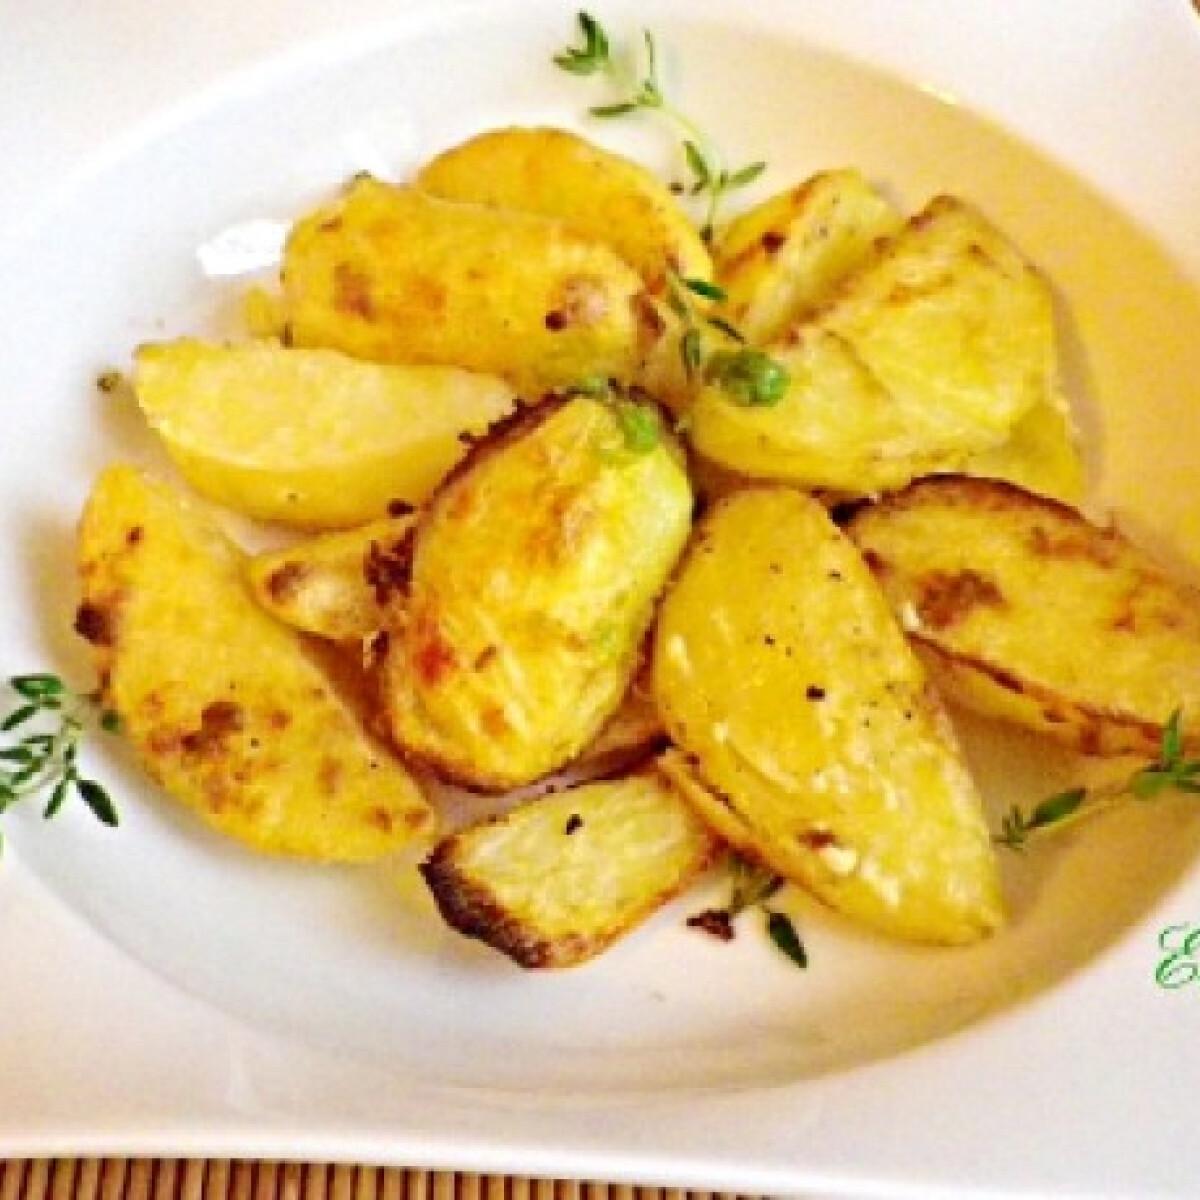 Wasabis krumpli